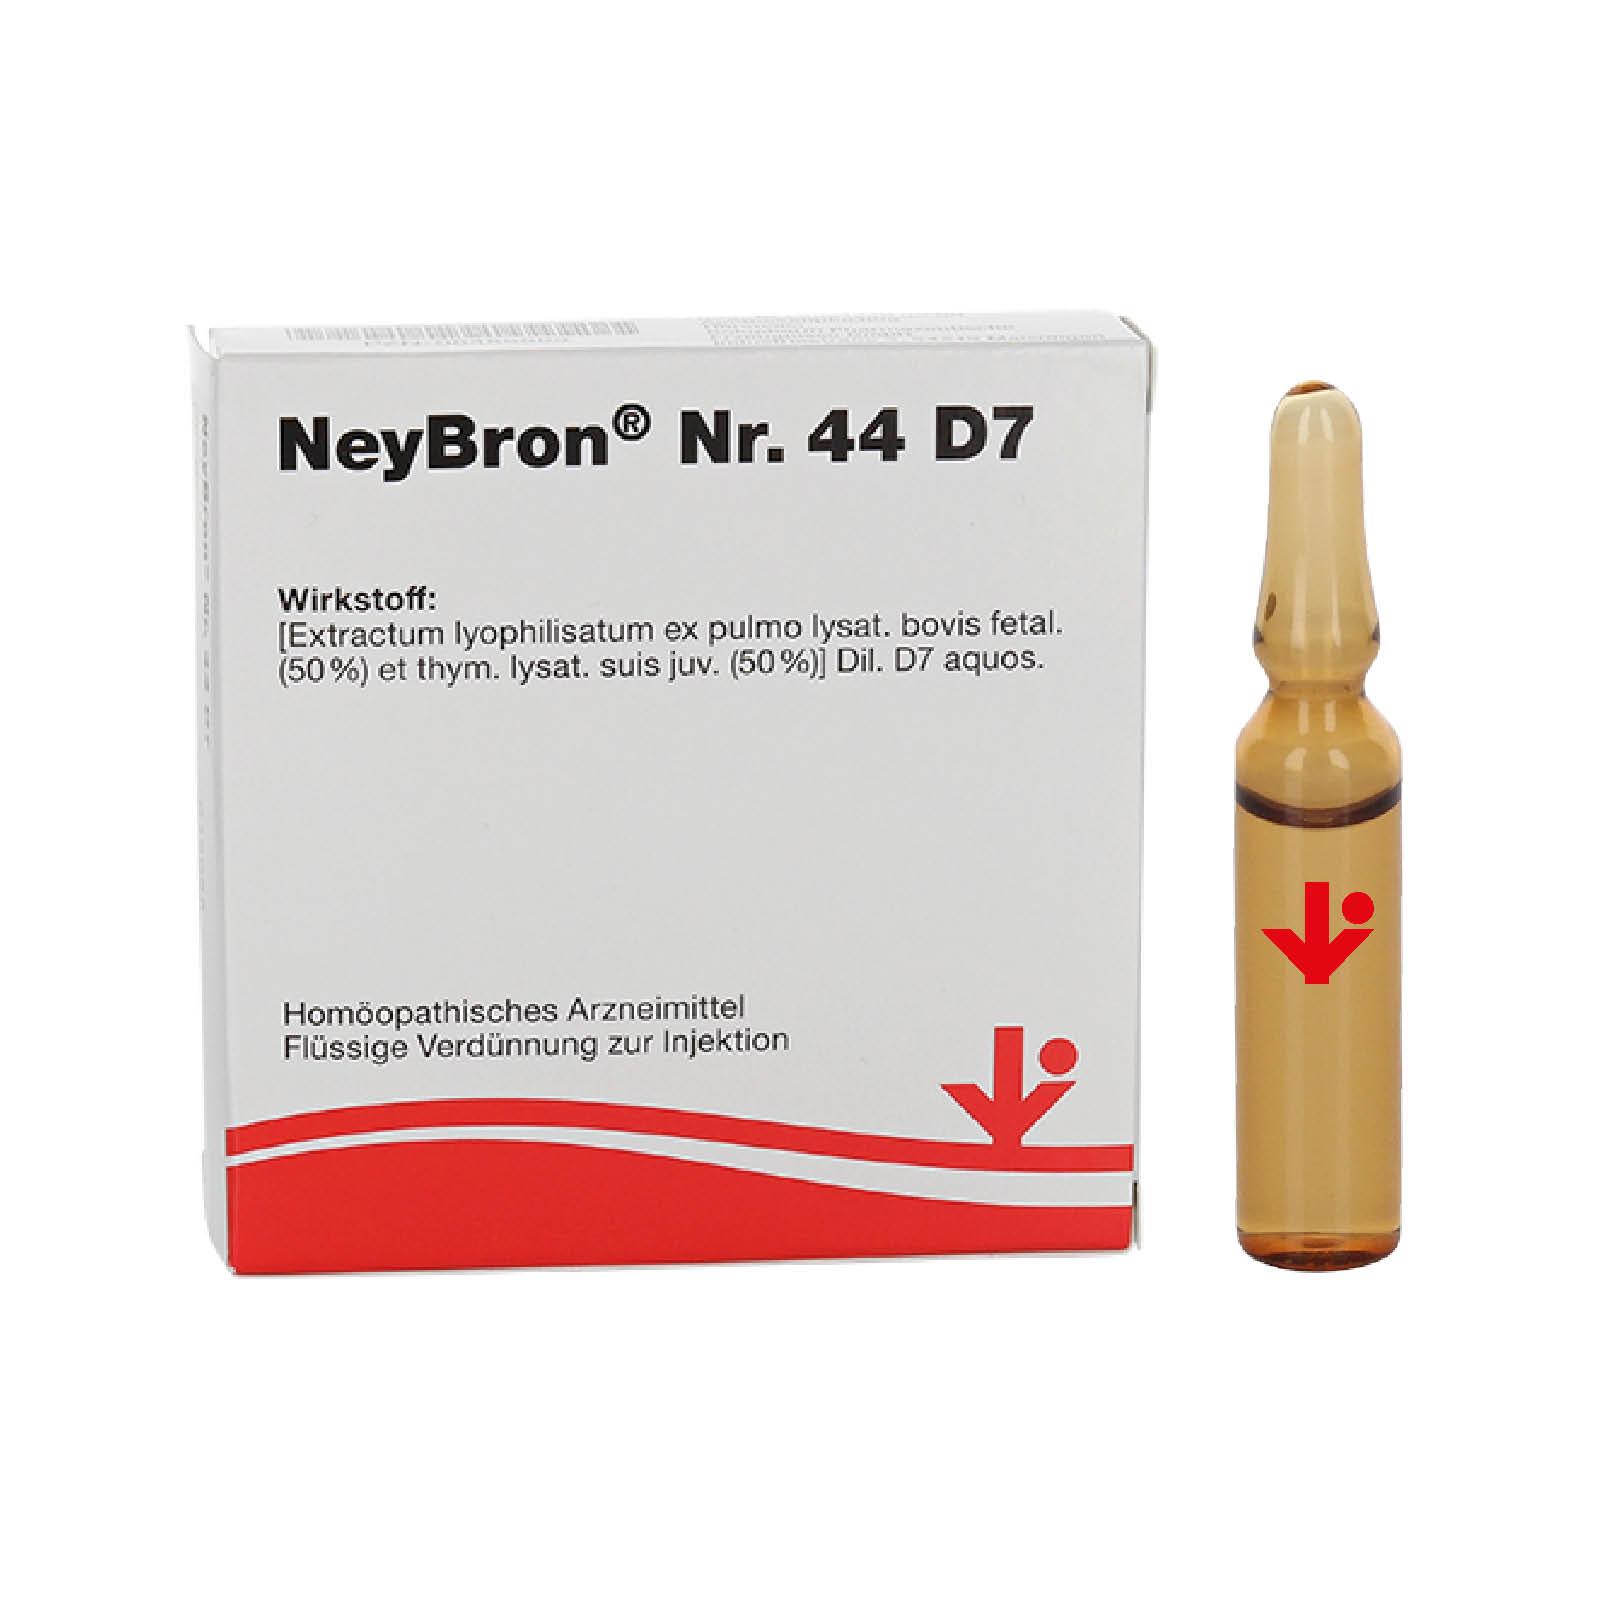 NeyBron® Nr. 44 D7 (früher NeyBronchin® genannt)